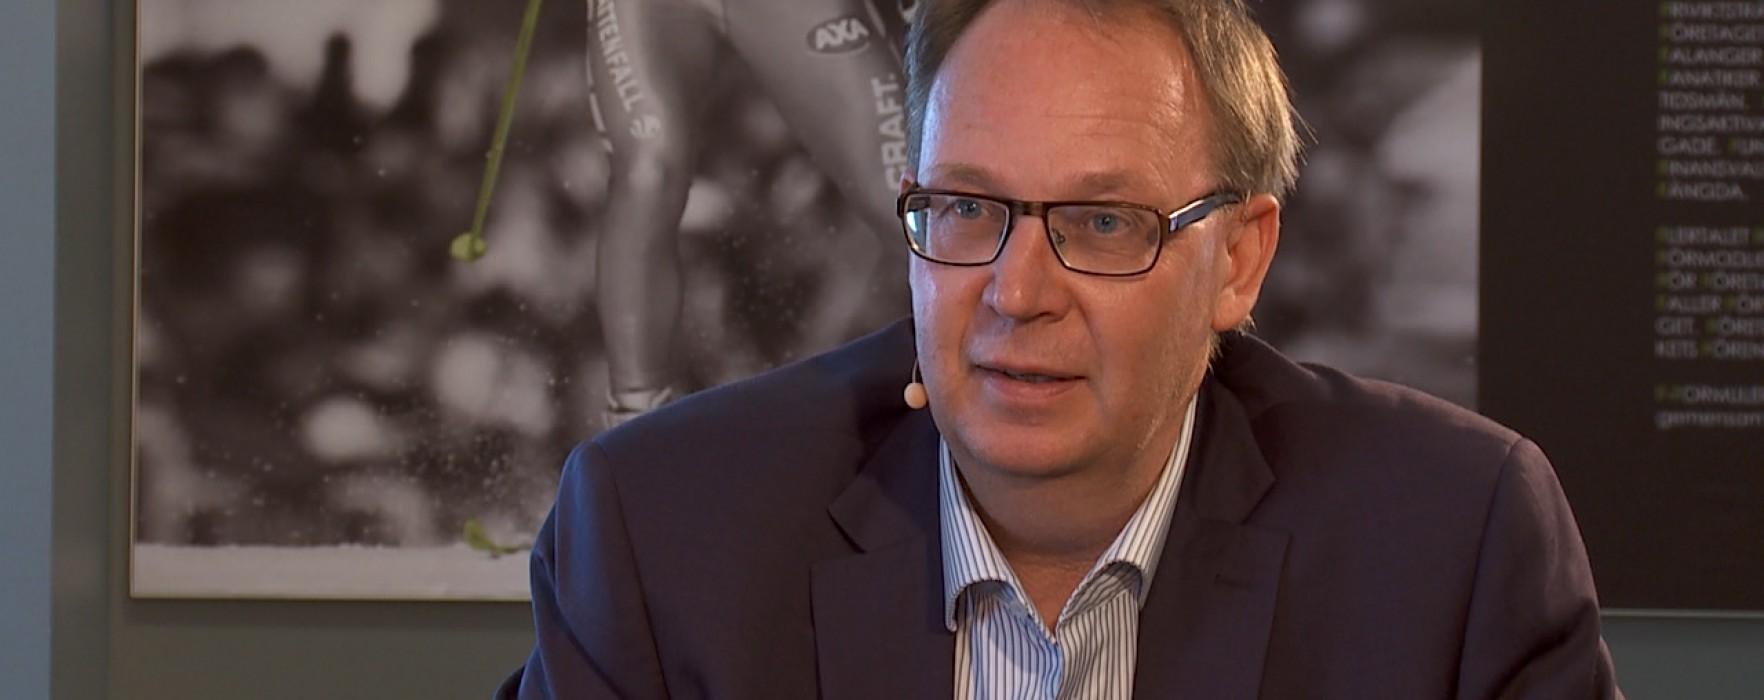 Glimt Sport – Stefan Olsson, Svensk Friidrott